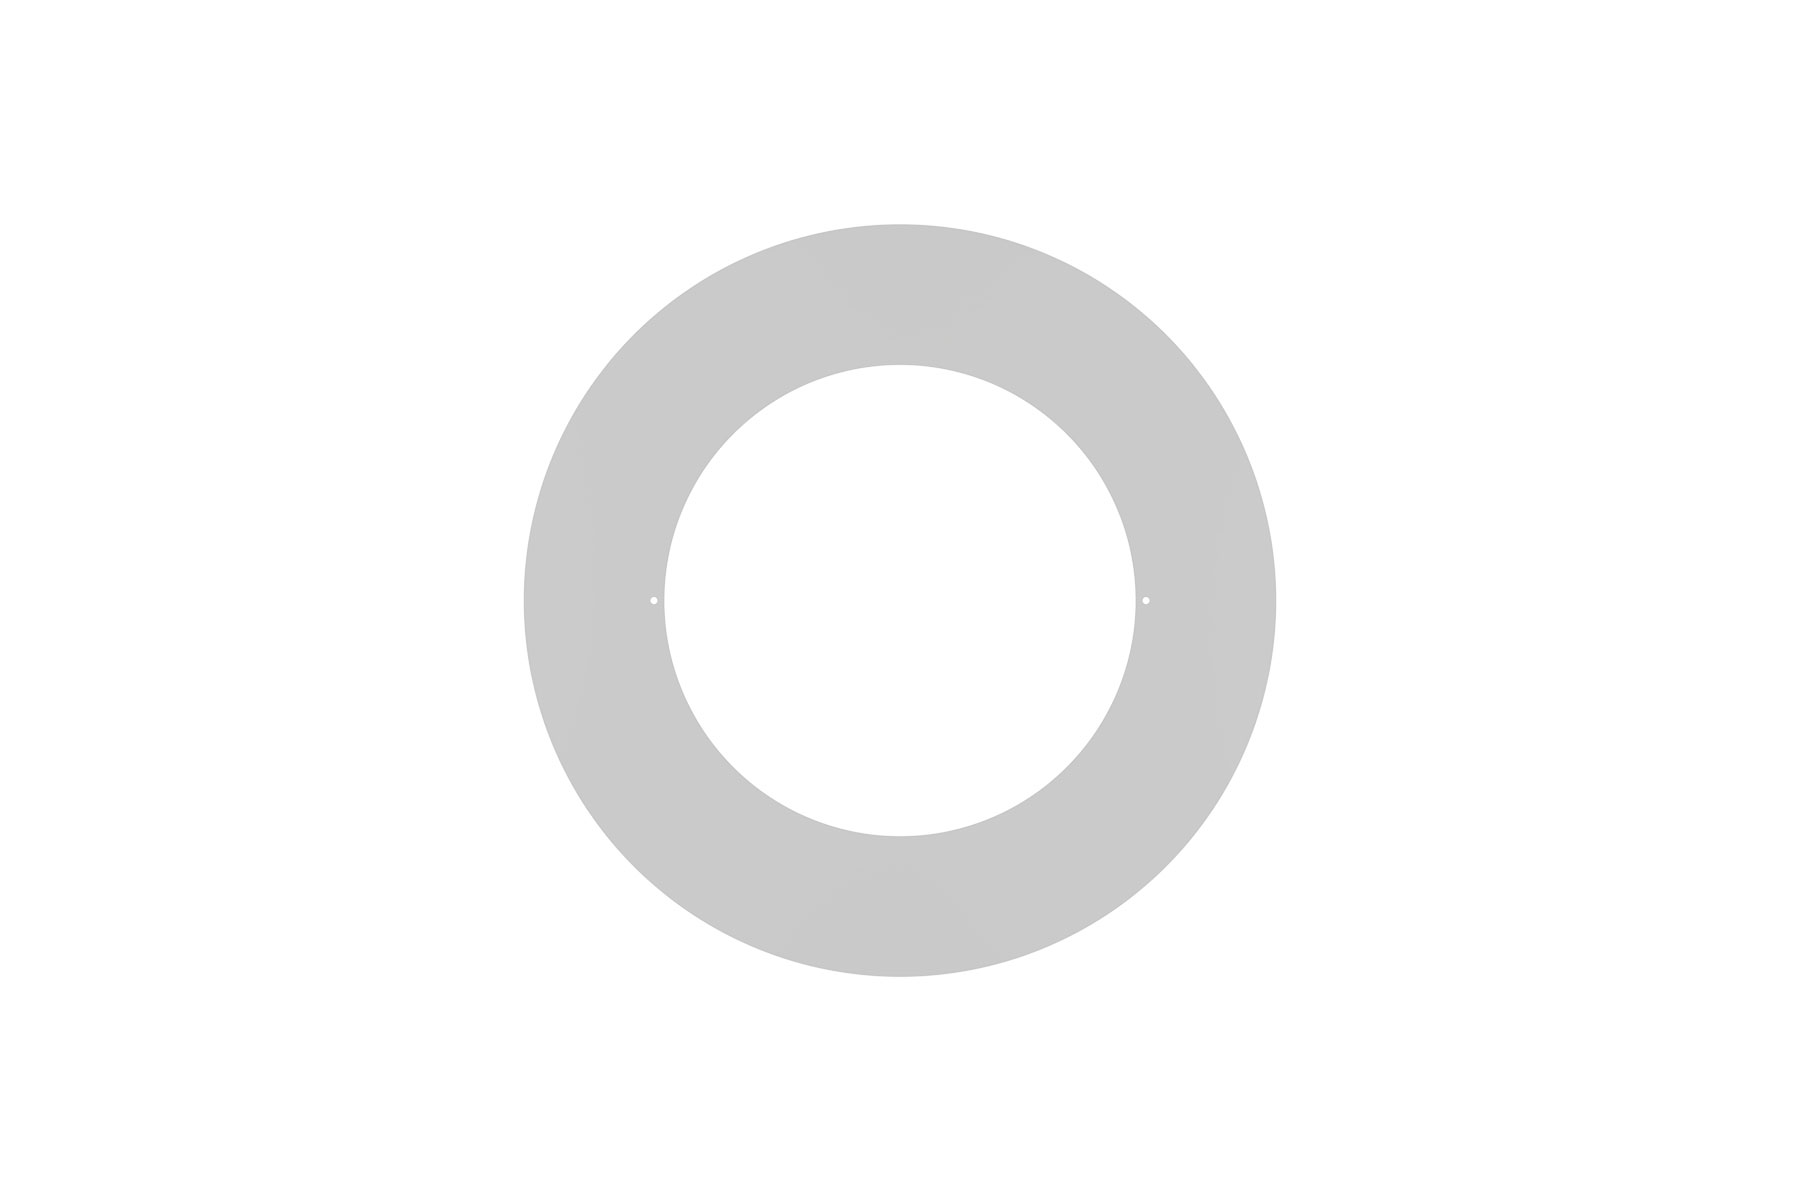 "Goof Ring Overall Diameter 10 1/2"" for DLCLR 6 Inch LED Commercial Recessed Light"